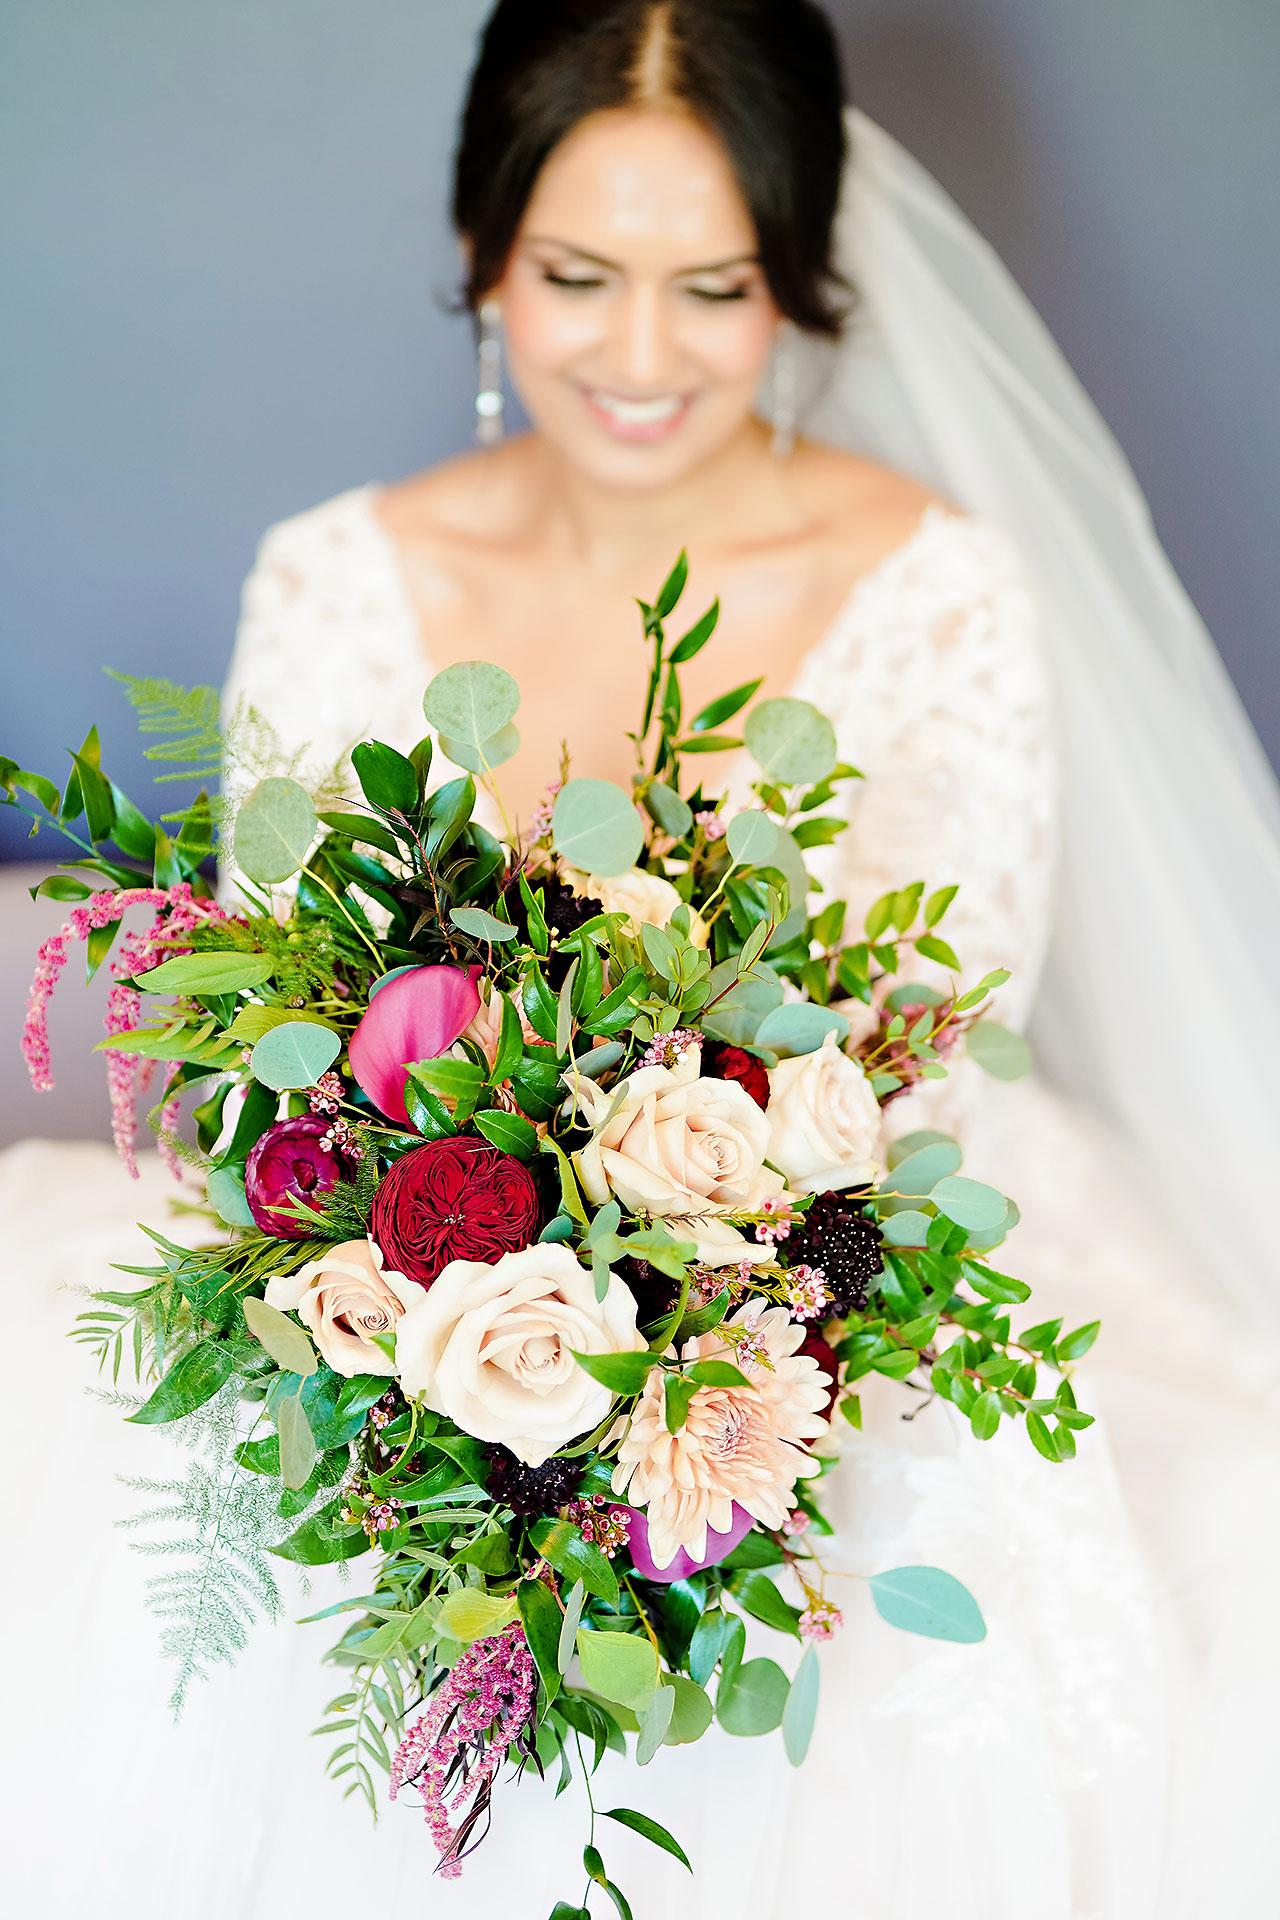 Nadia Parker Black Iris Estate Carmel Indiana Wedding May 2021 037